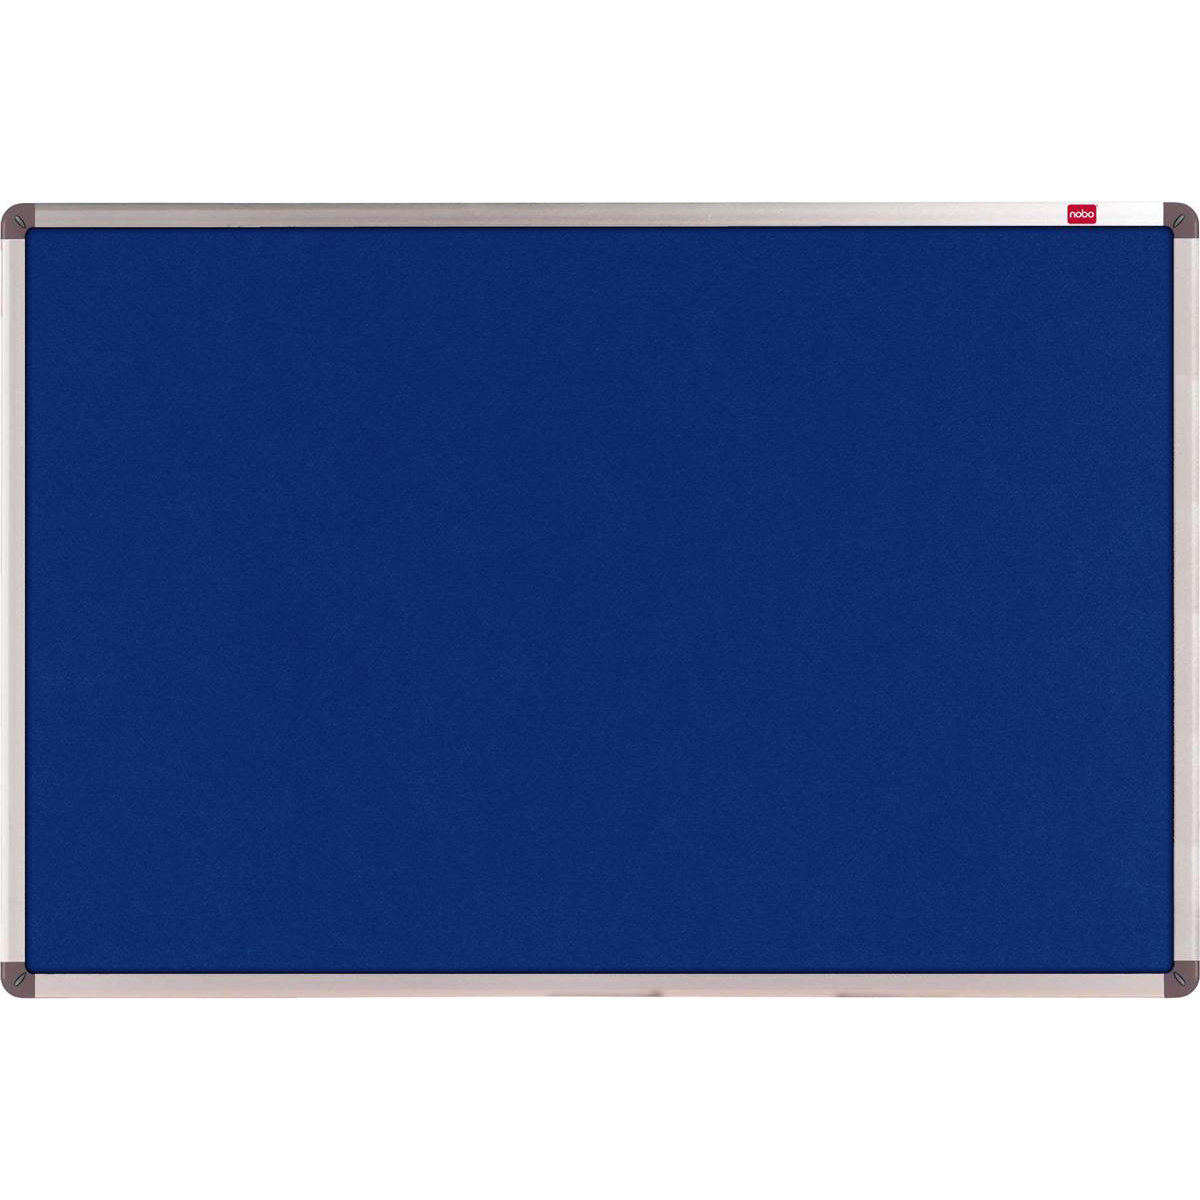 Felt Nobo Classic Noticeboard Felt with Aluminium Frame W1800xH1200mm Blue Ref 1900982